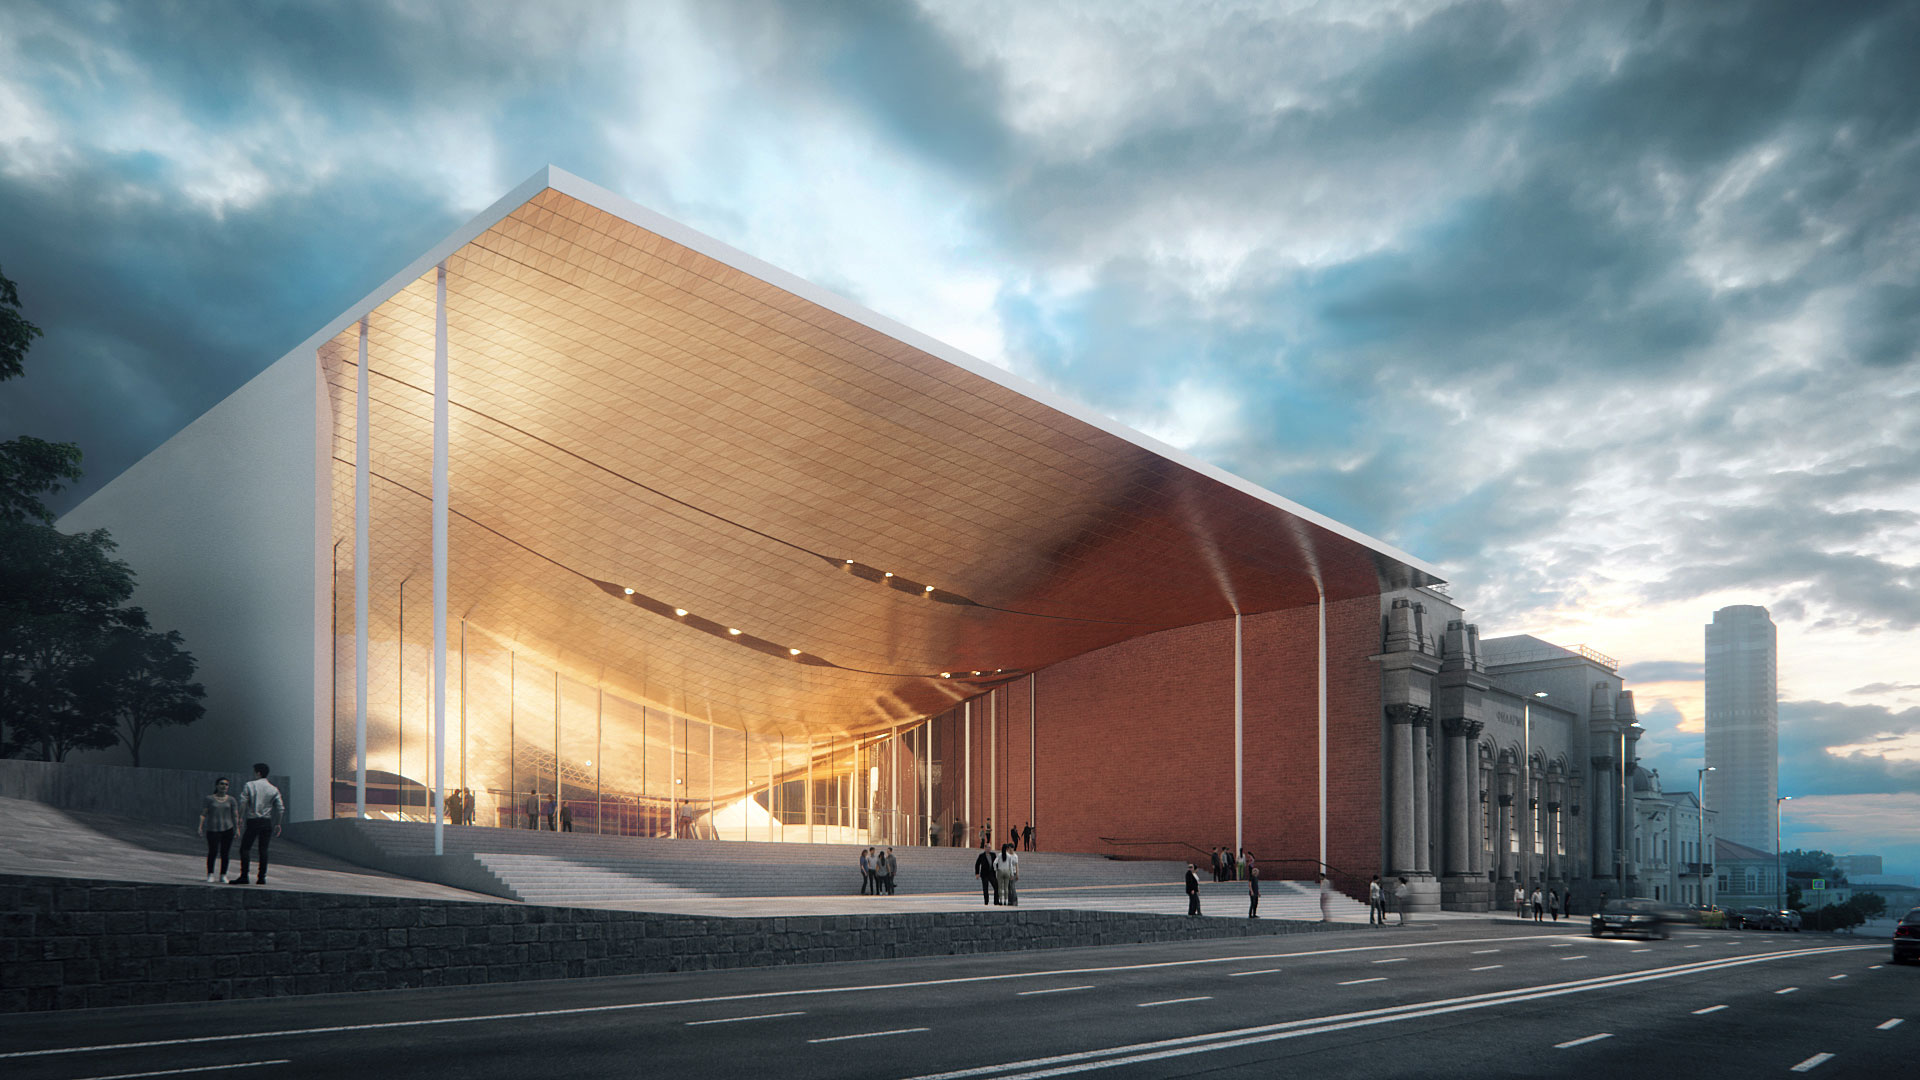 Russian Towns, Cities / Urban Development - Page 6 03_ZHA_Sverdlovsk-Philharmonic-Concert-Hall_Render-by-VA